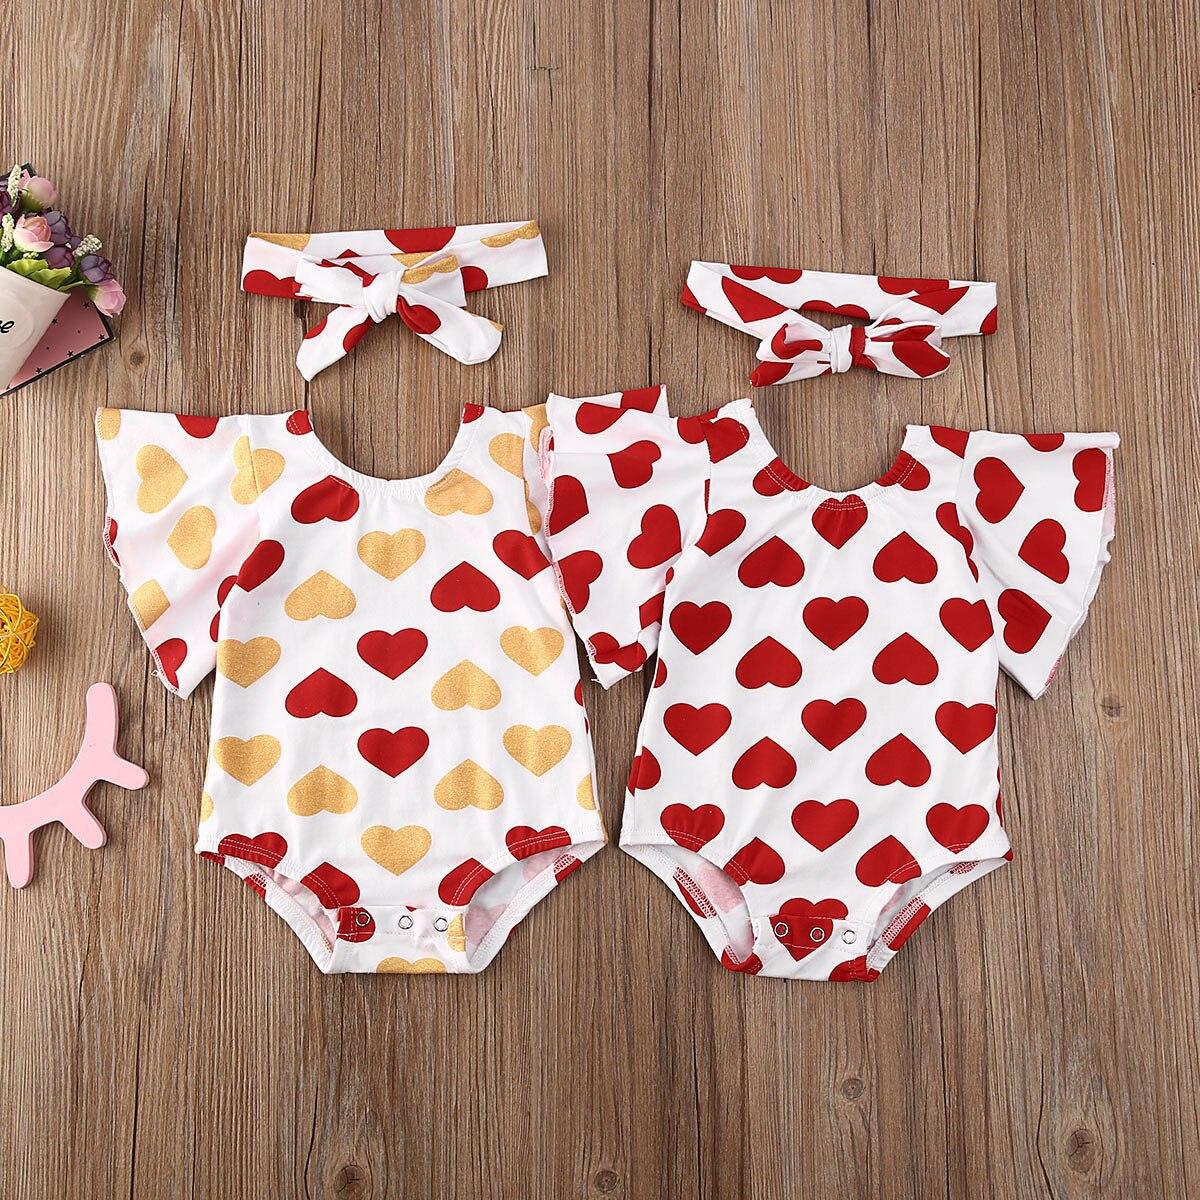 Summer Cute Newborn Baby Girl Valentine's Day Clothes Short Sleeves Heart Bodysuit Jumpsuit Headband Clothing